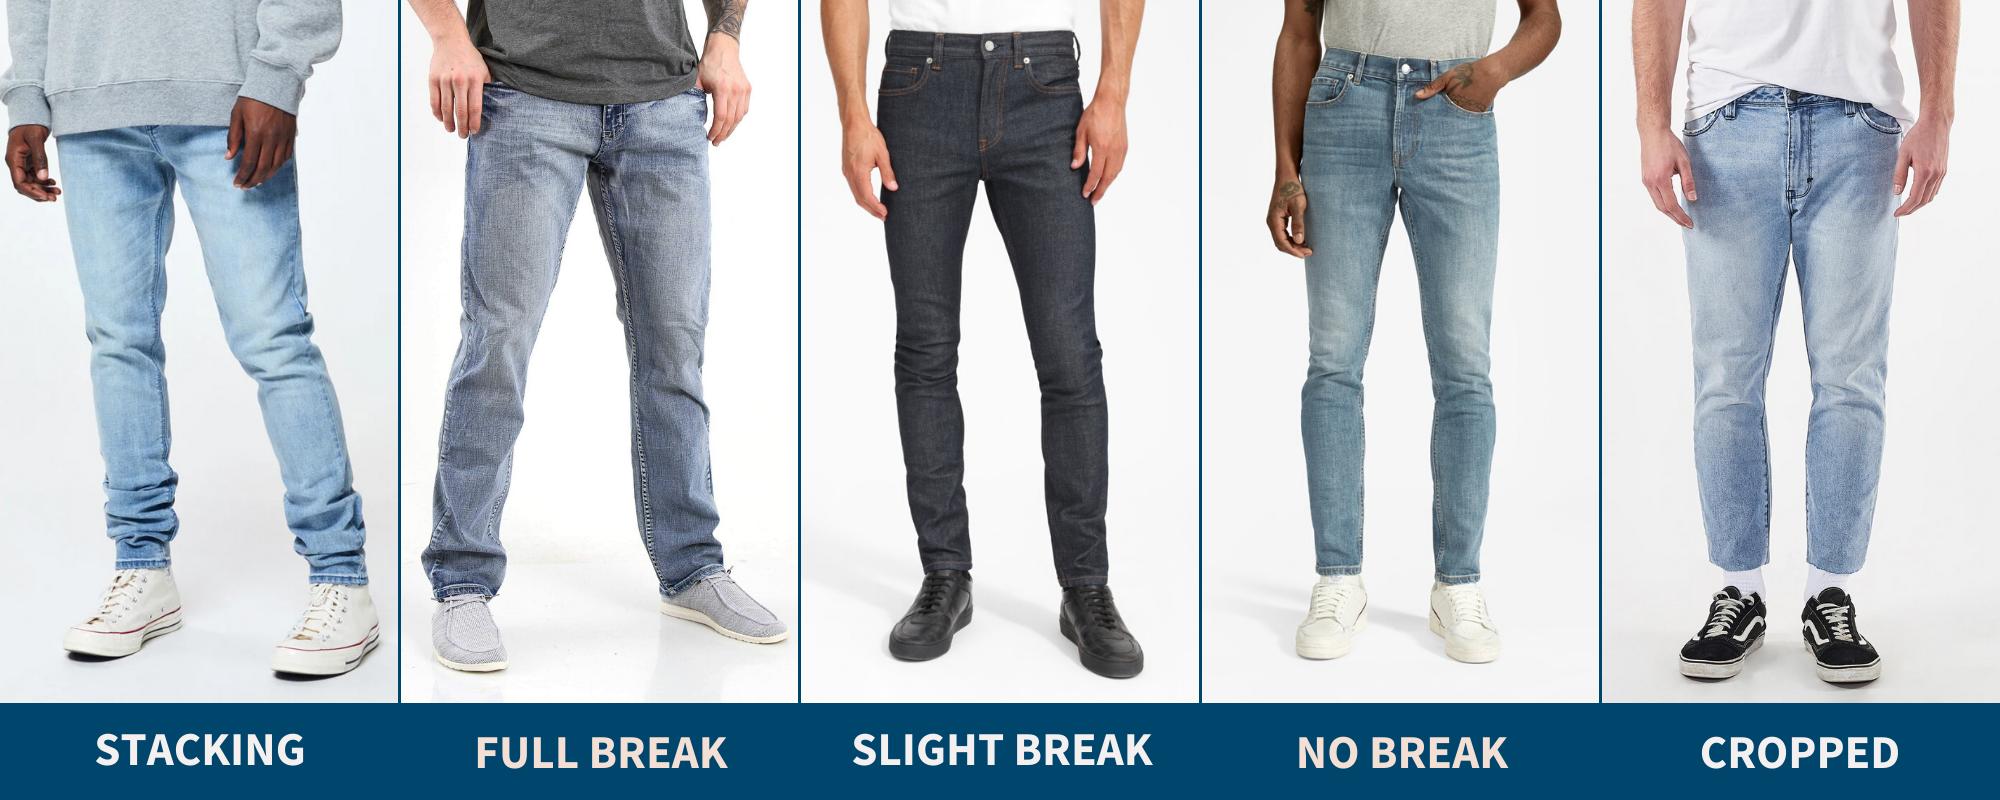 Pants break chart